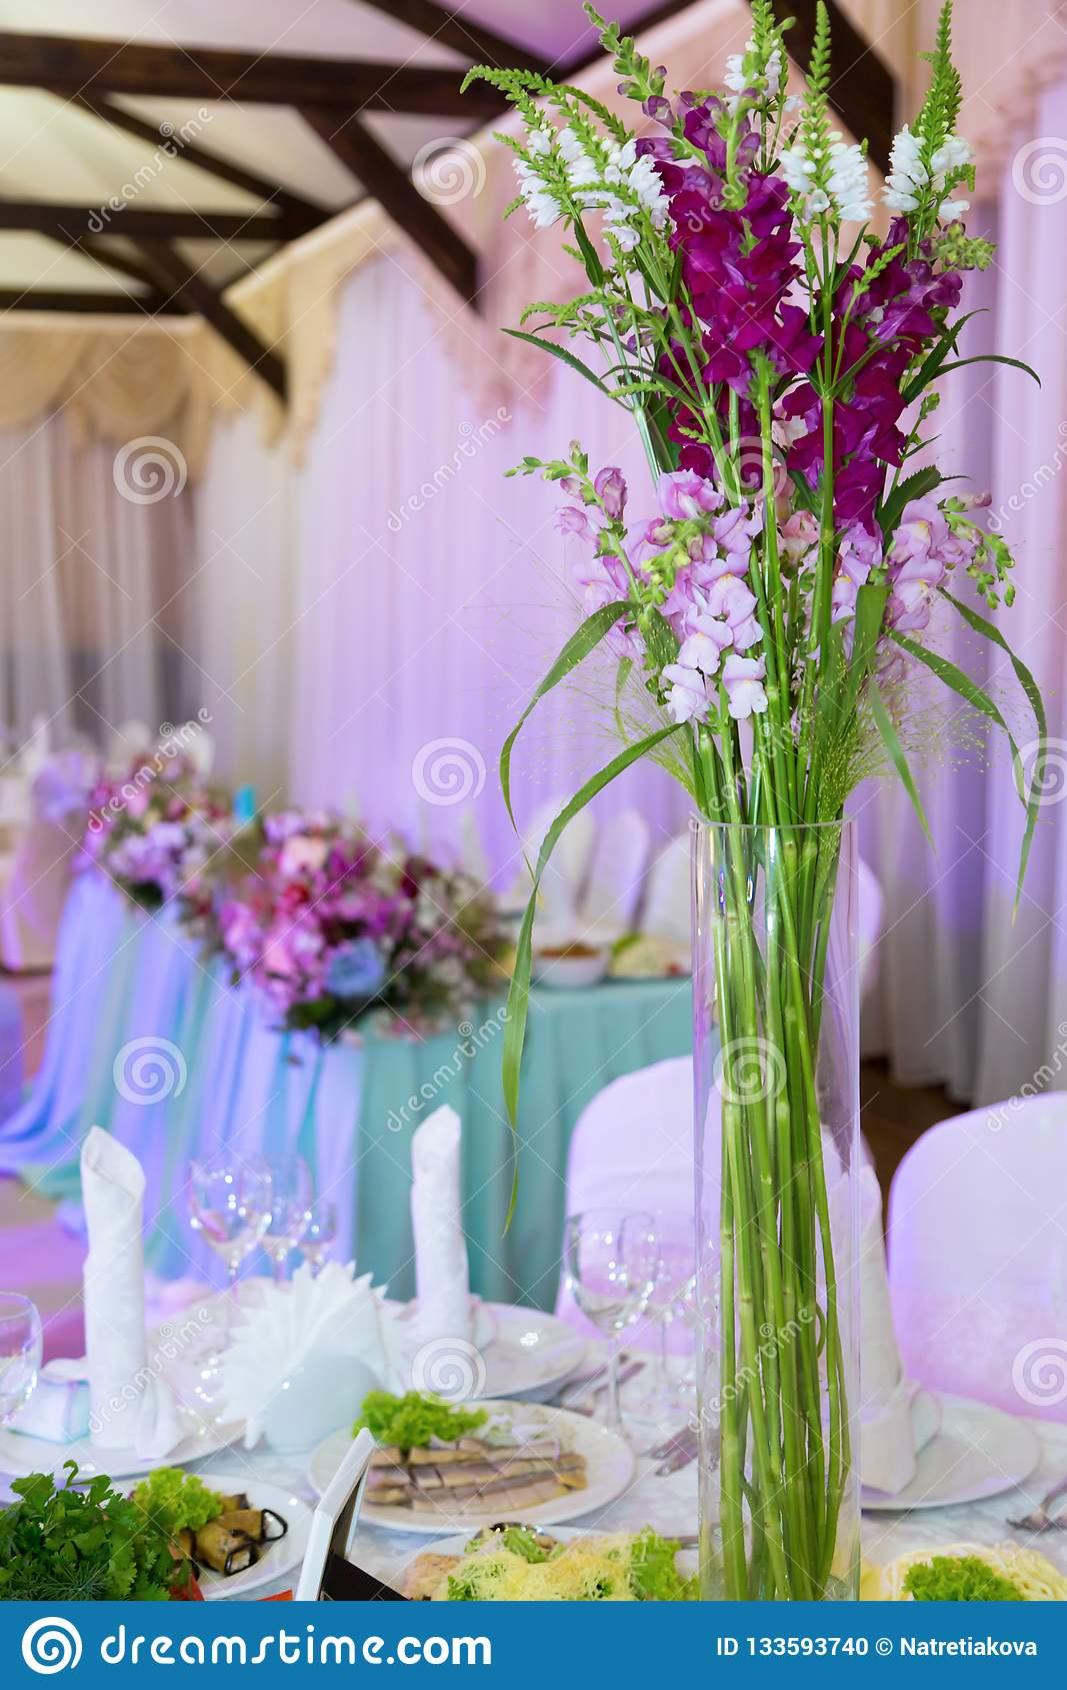 Banquet, tables, flowers, glasses